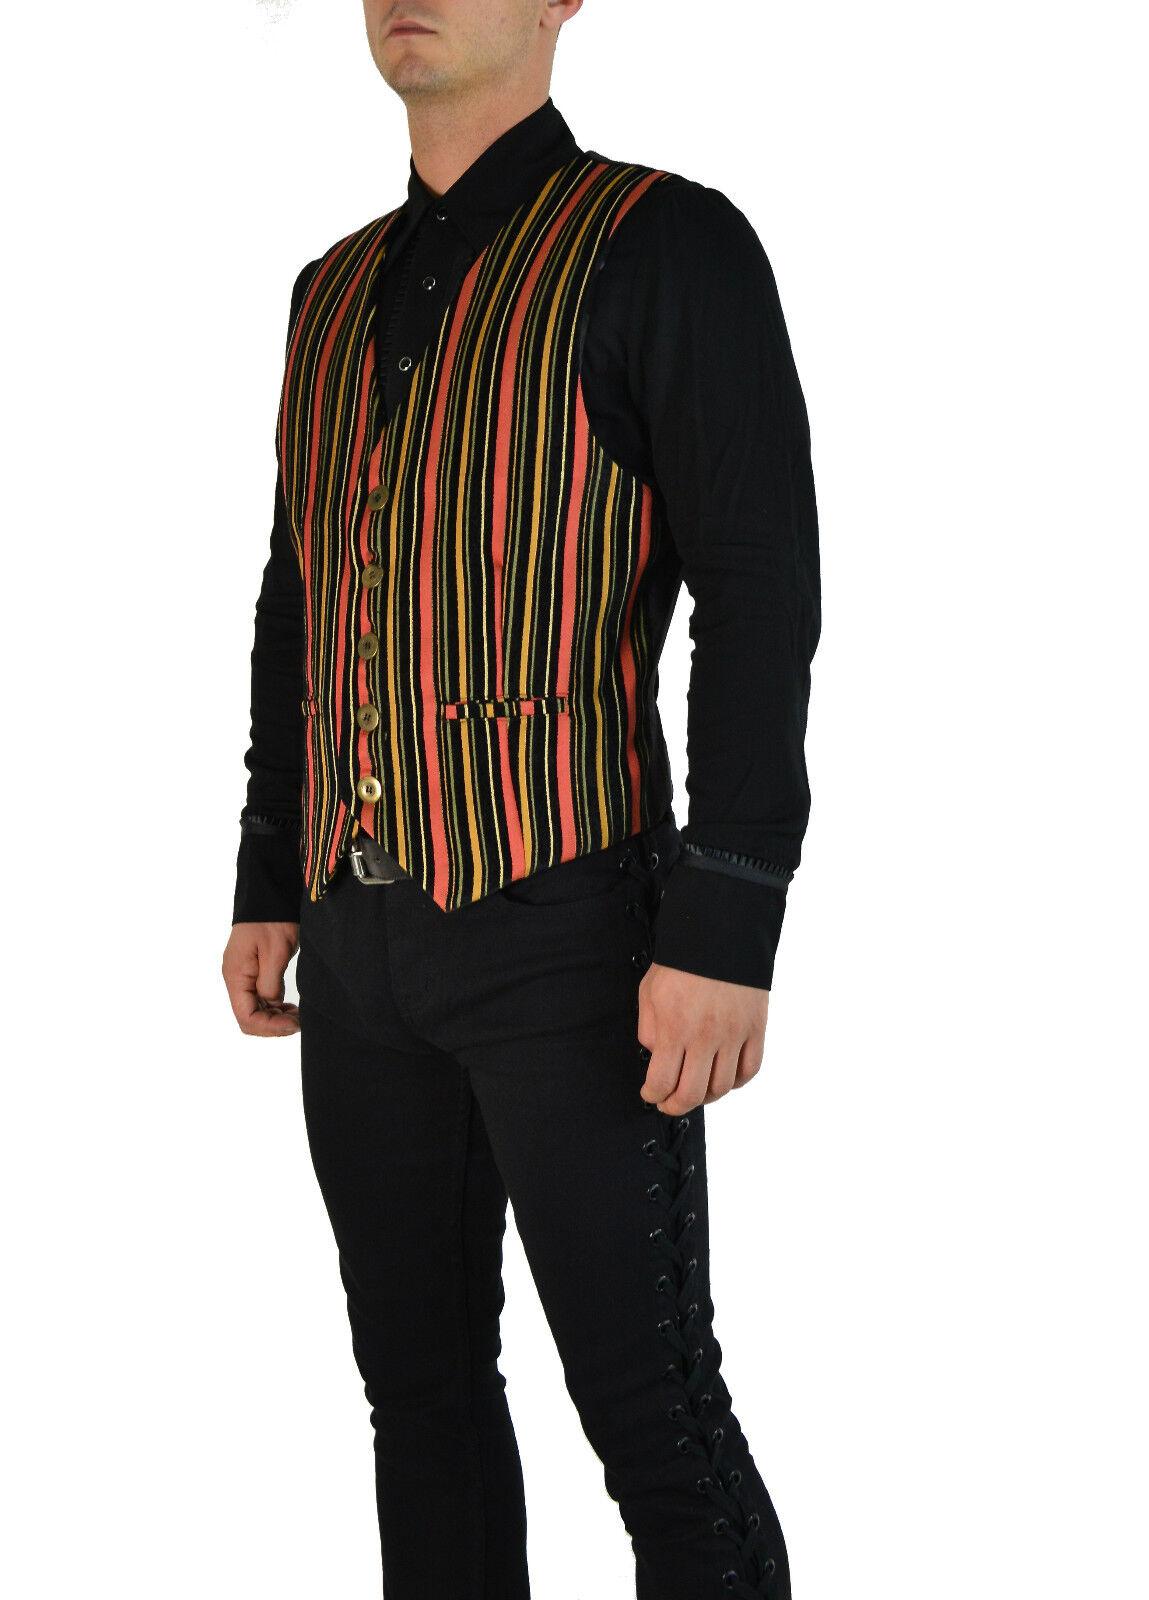 SHRINE GATSBY ARISTOCRAT VEST JACKET VICTORIAN VELVET GOTHIC COWBOY STEAMPUNK Clothing, Shoes & Accessories